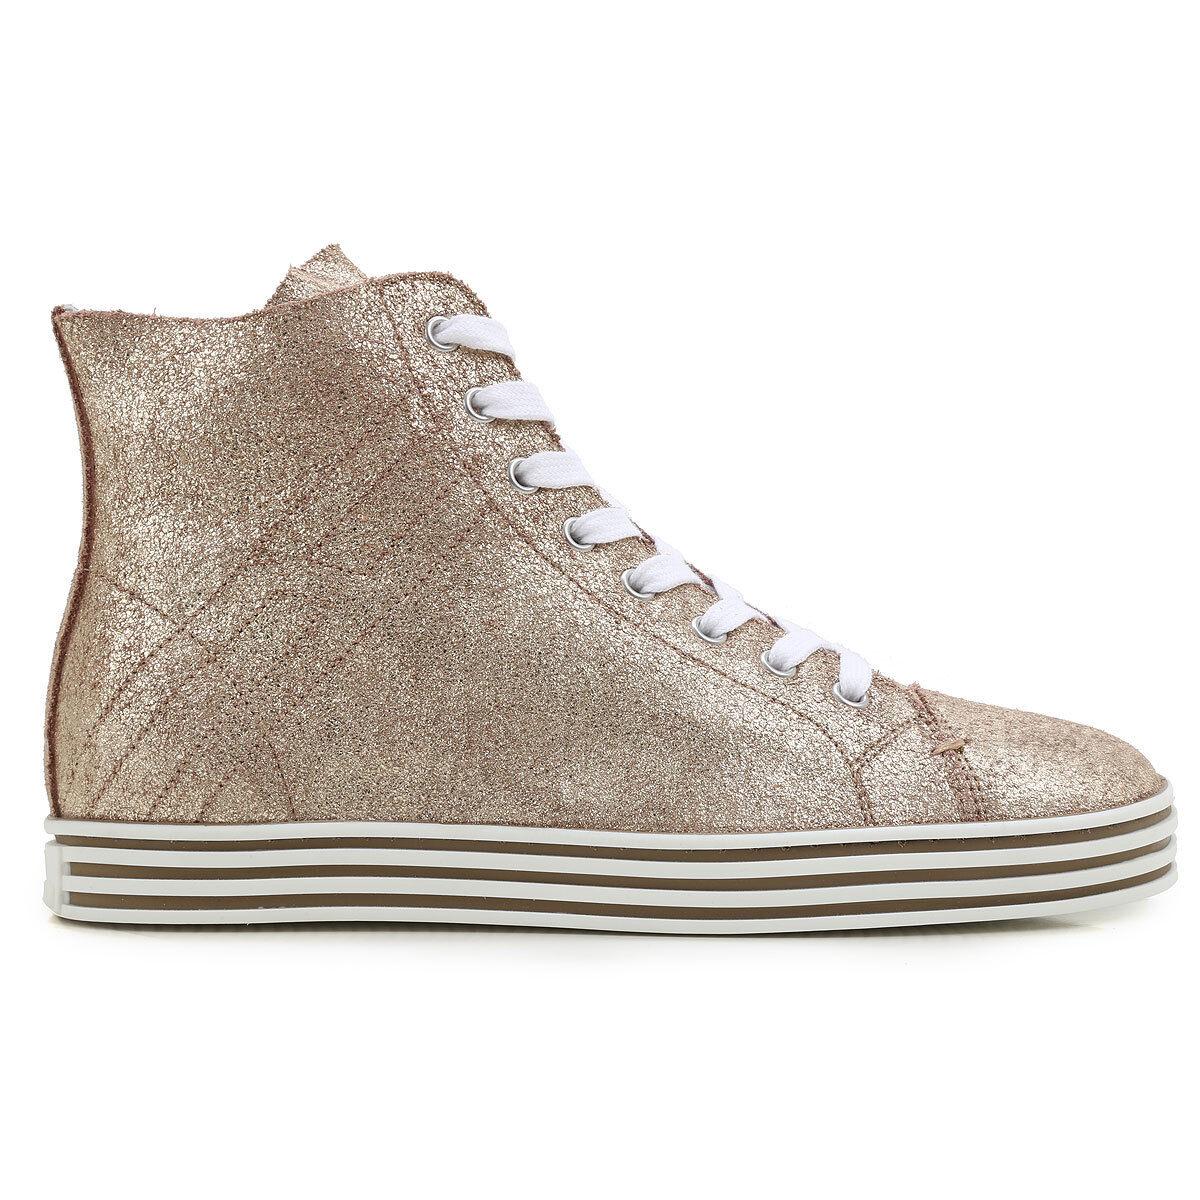 HOGAN REBEL zapatos mujer zapatos mujershuhe zapatillas zapatillas zapatillas 100%AUTHENTIC talco  Precio por piso